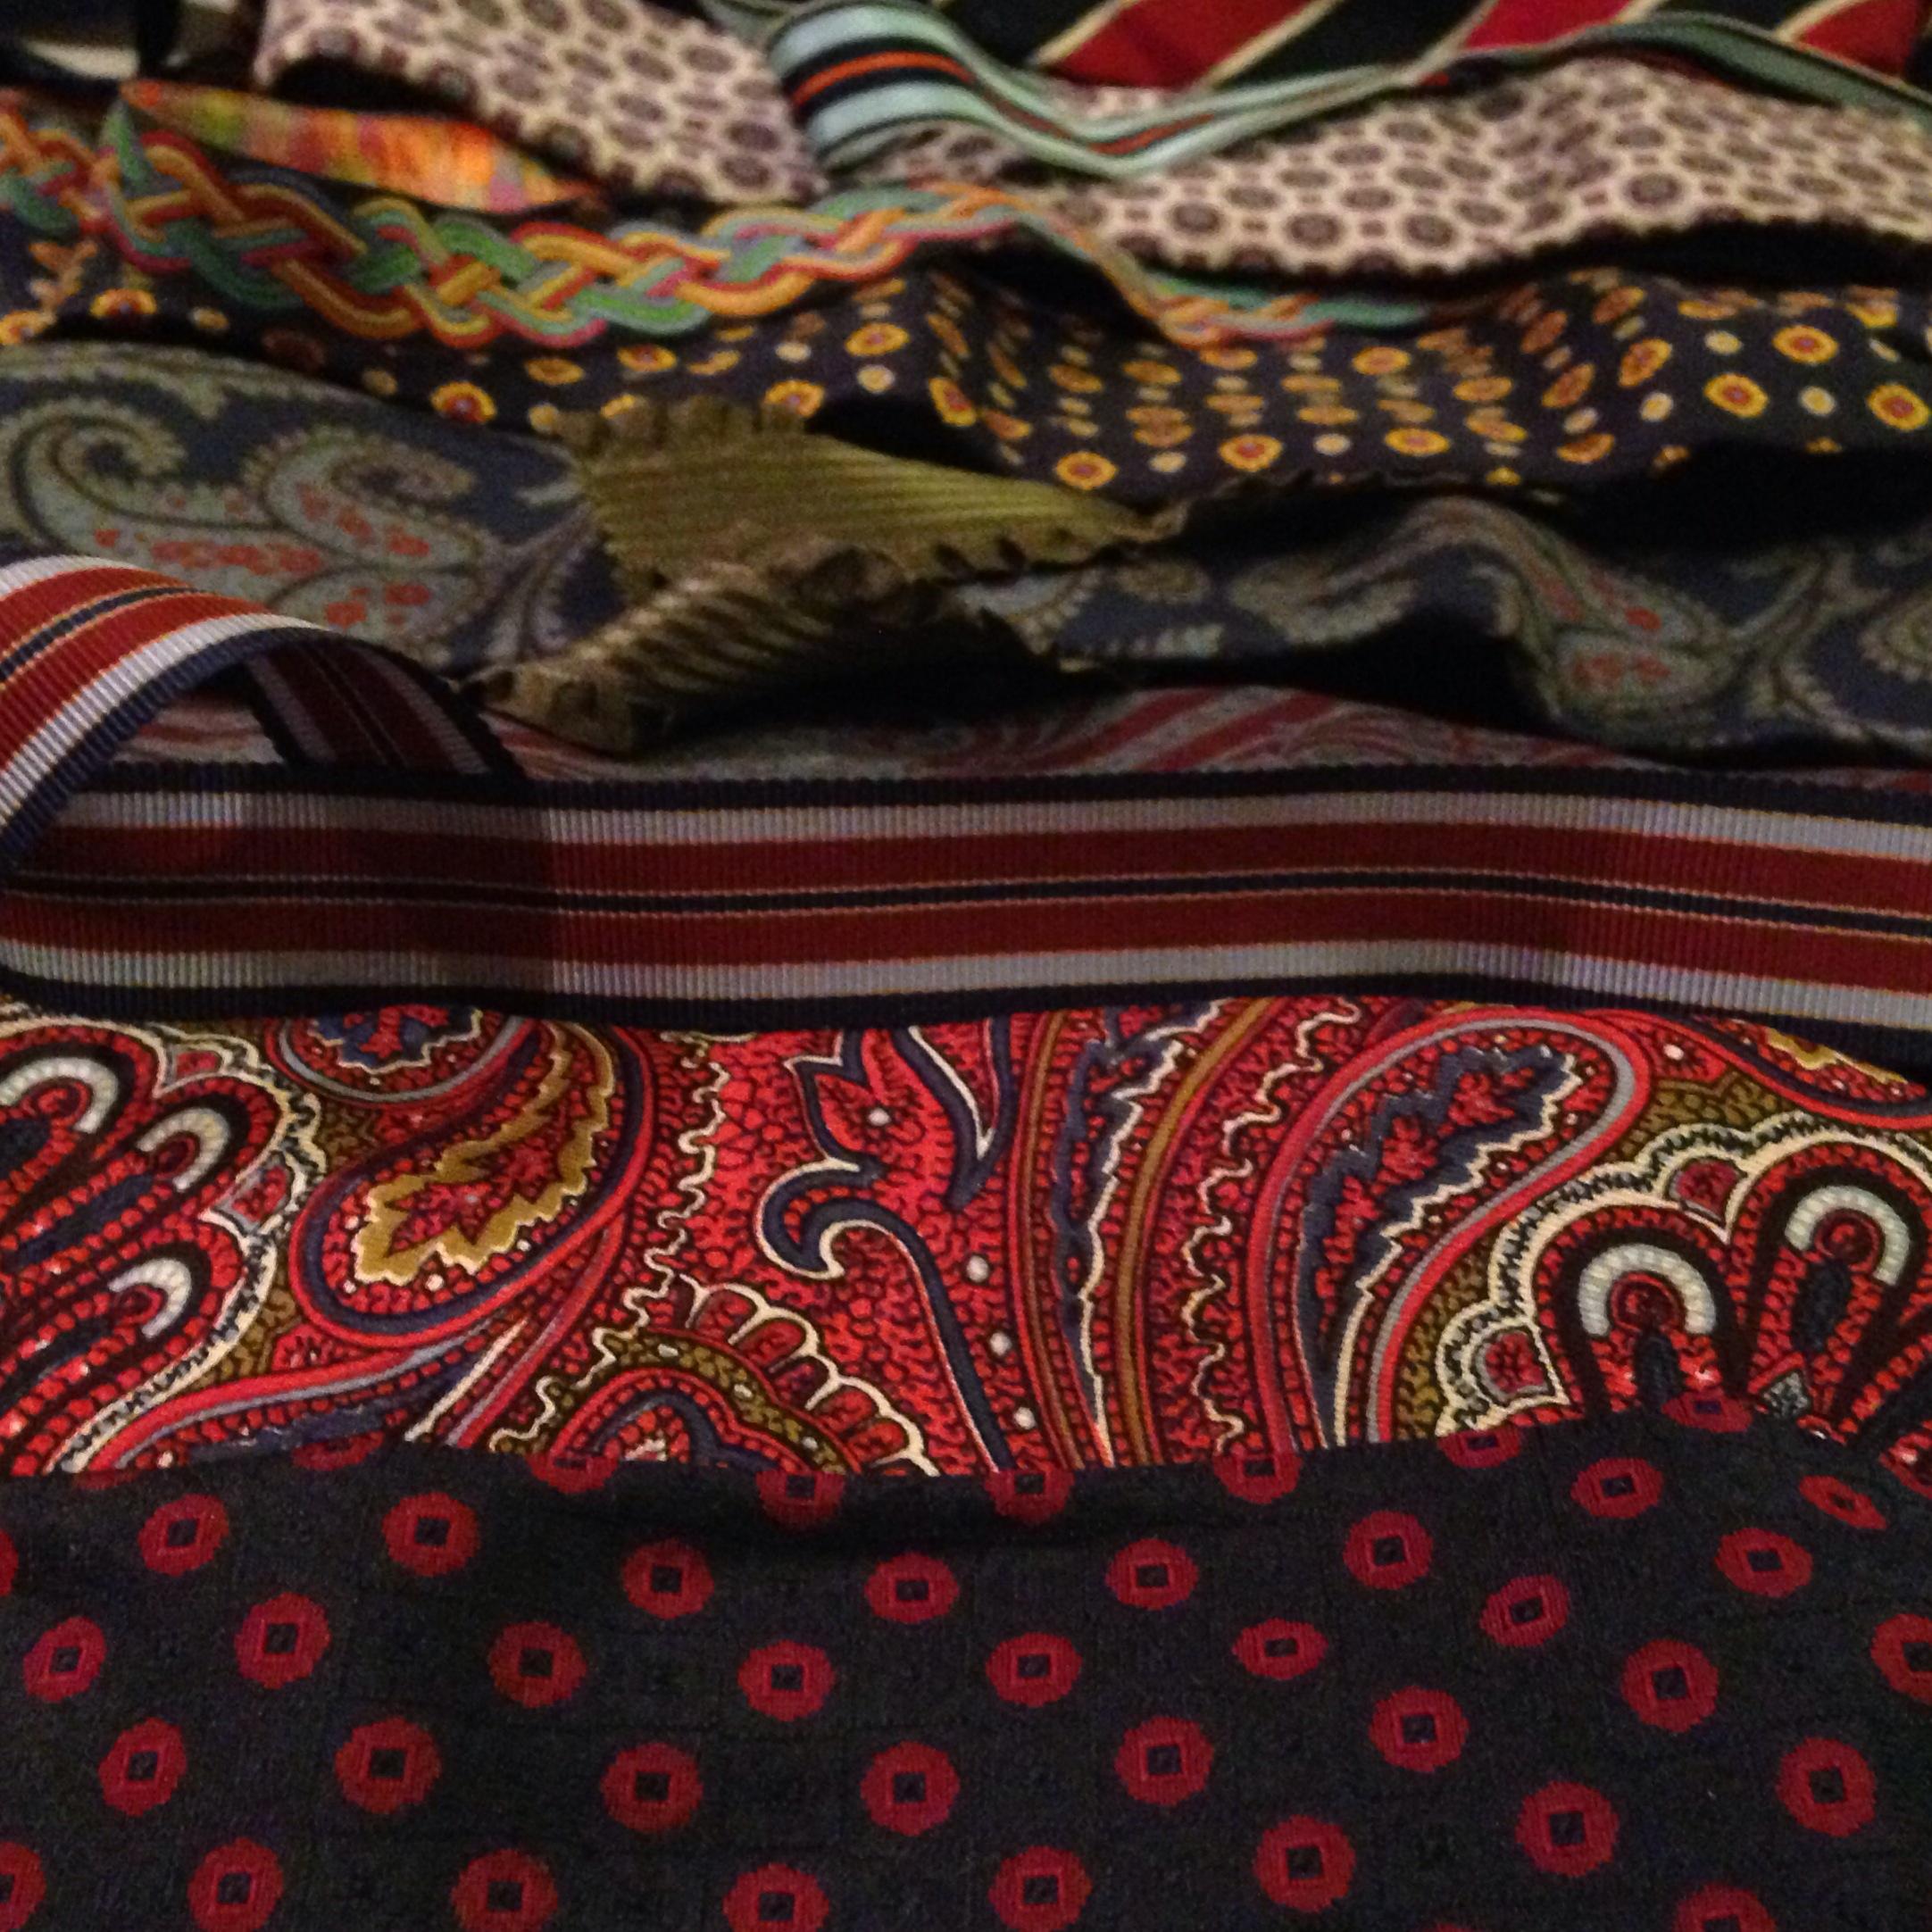 future e.b.friday necktie buckle belts